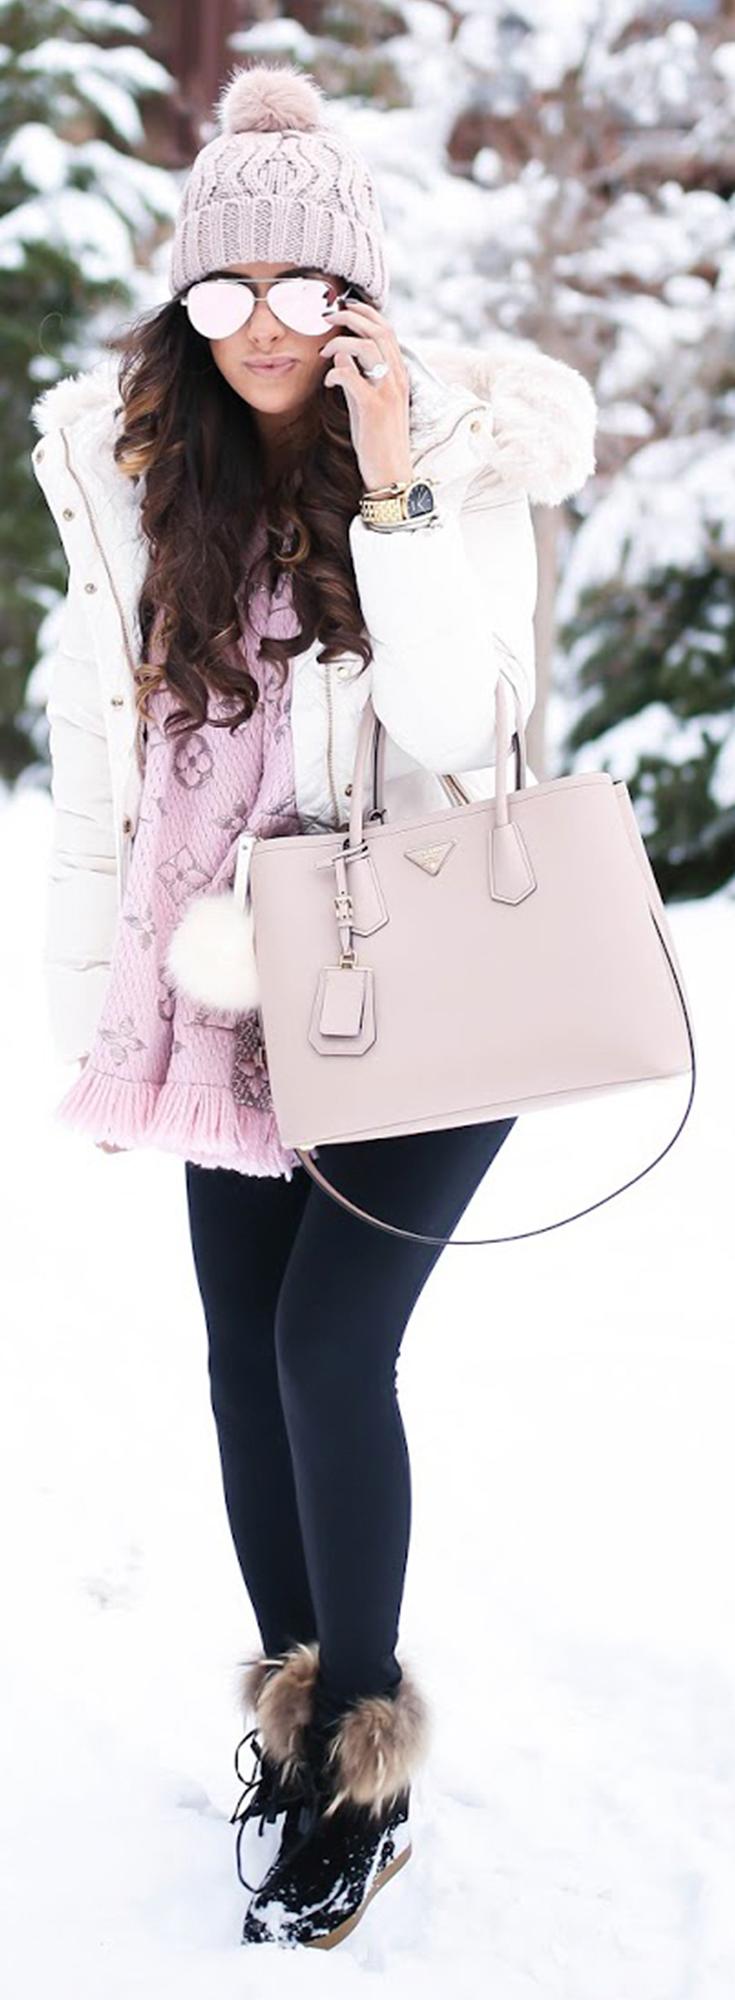 JACKET: old  BEANIE: H&M  SUNGLASSES   LEGGINGS:Zella  TEE:BP  HANDBAG:Prada  WATCH:Nixon  BRACELETS:The Styled Collectionc/o,David Yurman BOOTIES:Cecelia New York   SCARF:LV (RoseBallerine). The Sweetest Thing Blog, Emily Gemma Outfit. Fashion Style for Winter. Fashion Inspiration for Winter. #thesweetestthingblog #emilygemma #wintertrends #fashionstyle